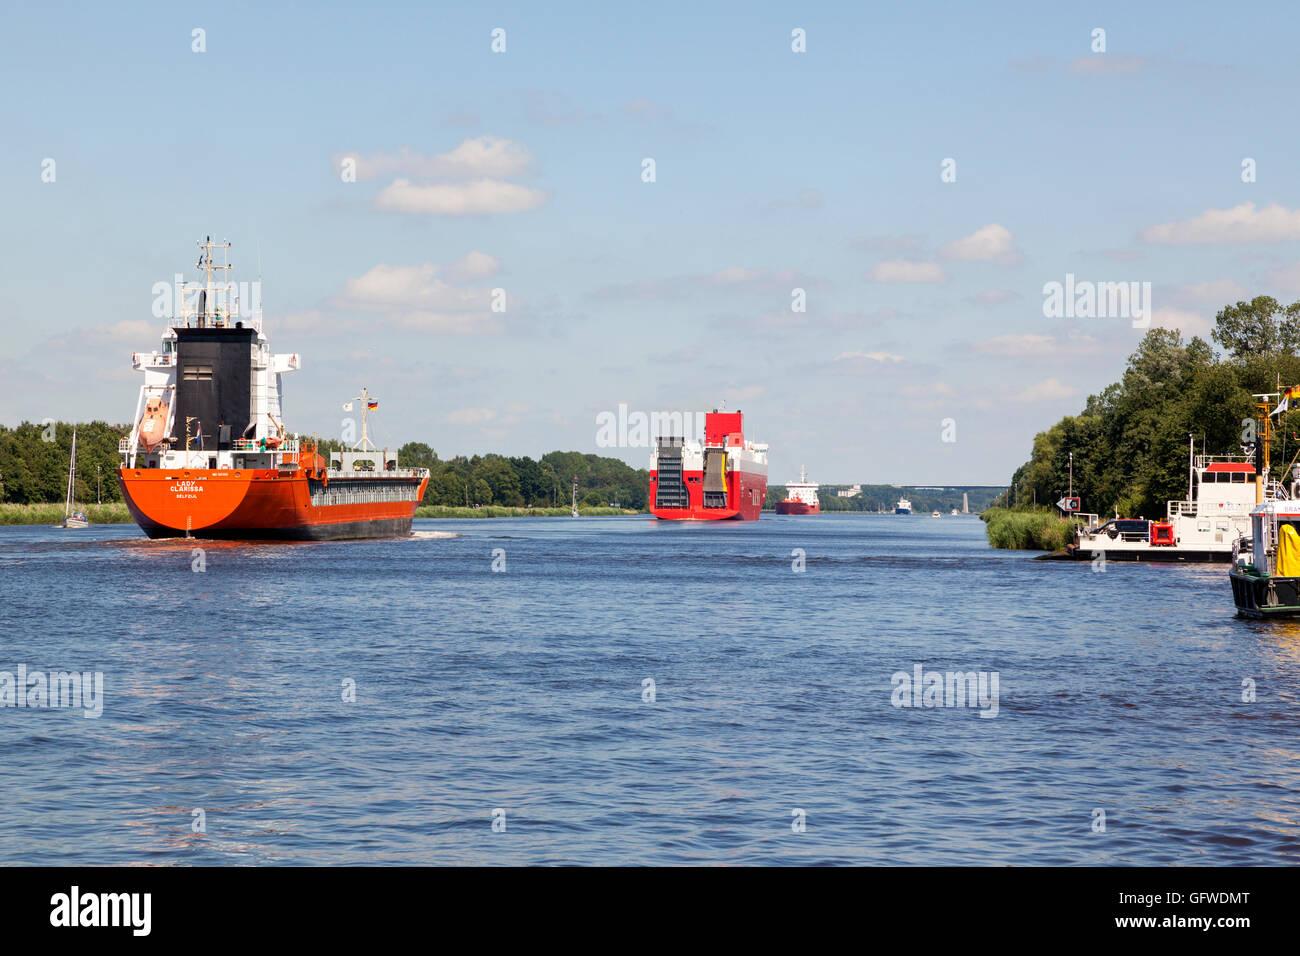 Traffic on Kiel Canal - Stock Image